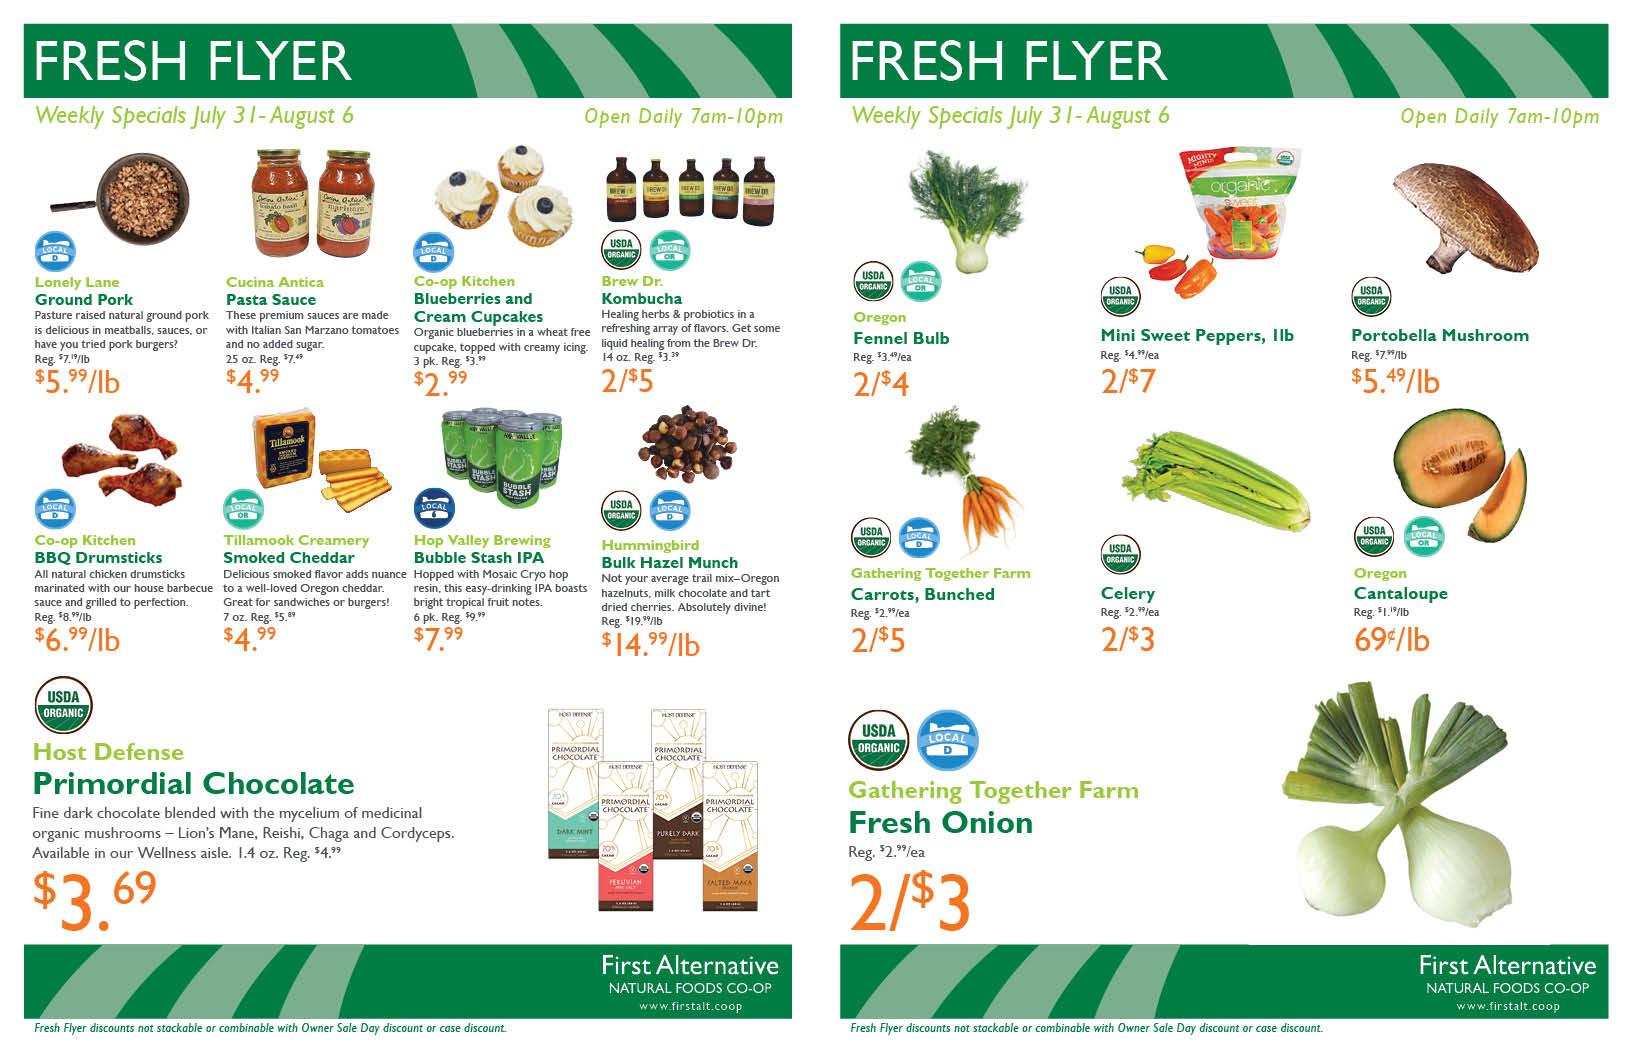 First Alternative Co-op Fresh Flyer July 31 - August 6